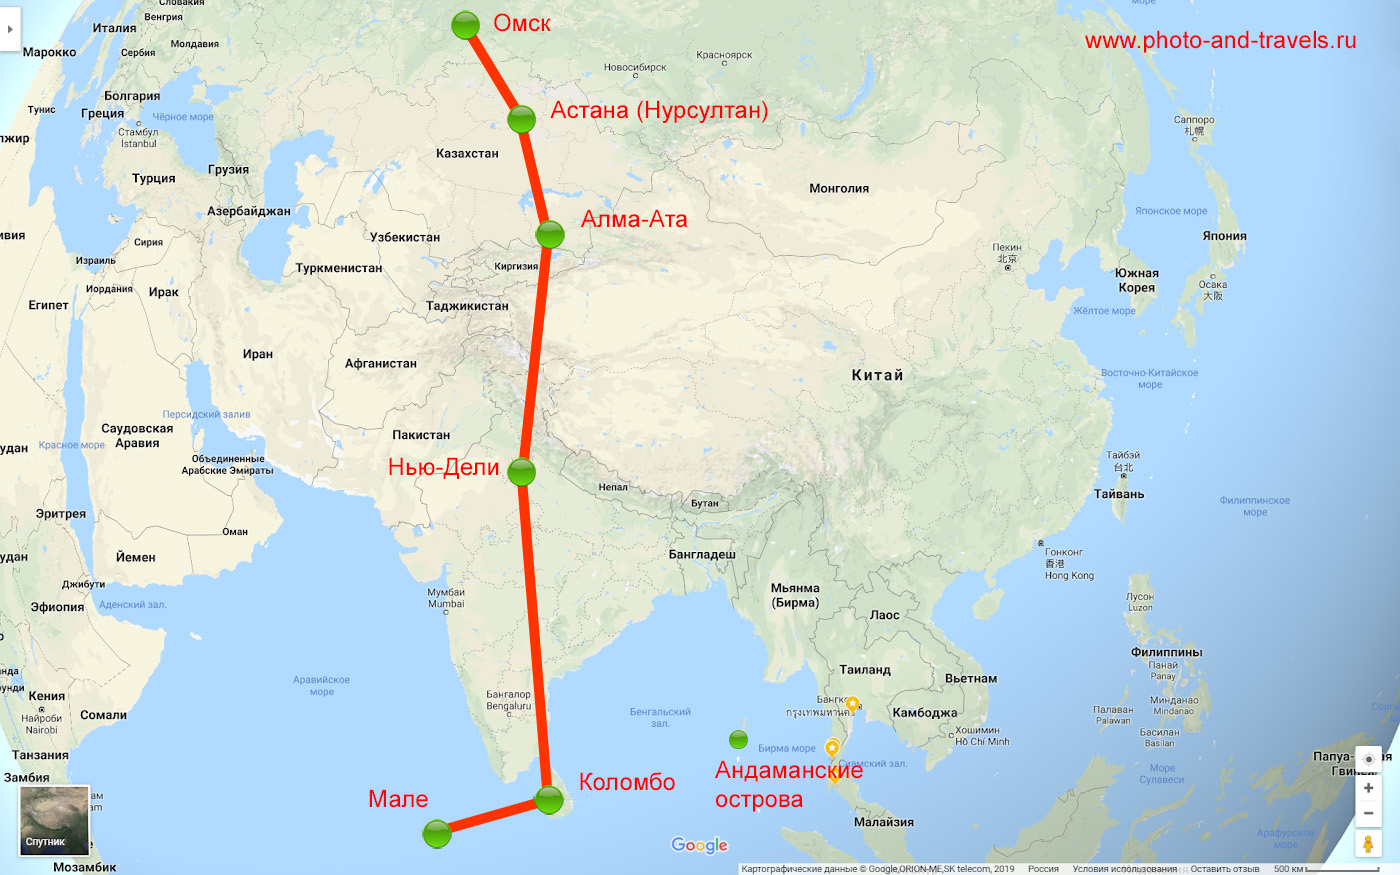 Карта со схемой путешествия по маршруту «Омск – Астана – Алма-Ата – Дели – Коломбо – Мале».